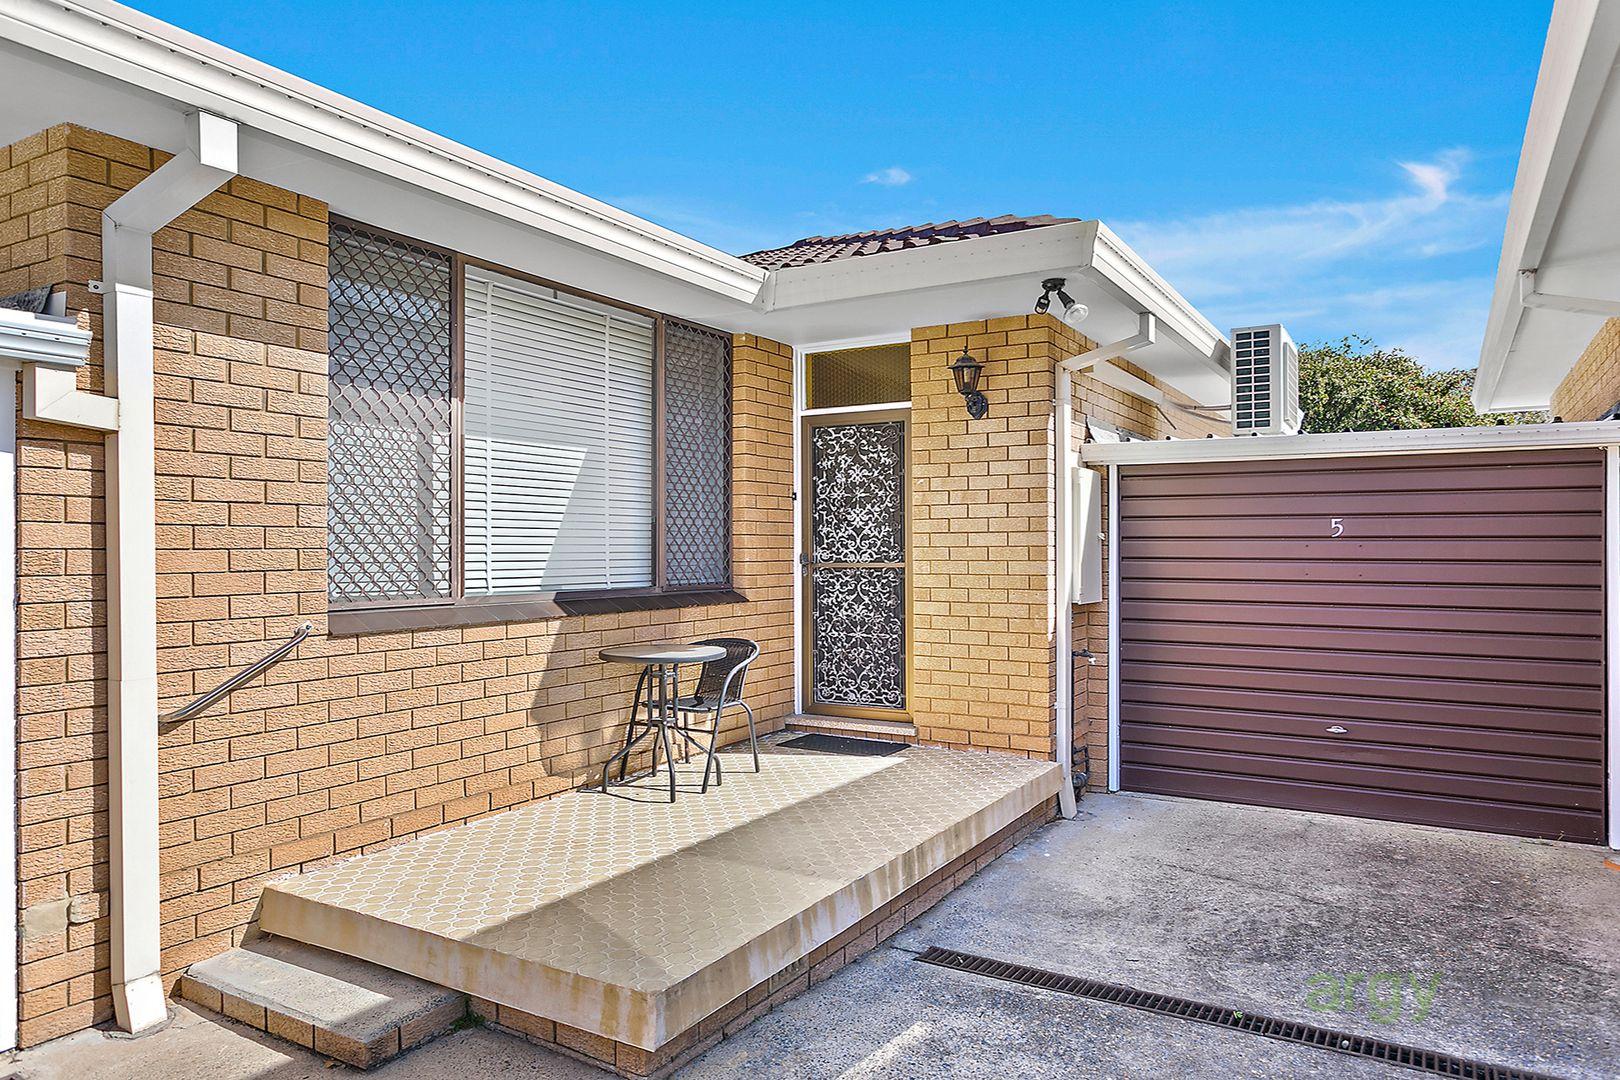 5/11-15 Eddystone Road, Bexley NSW 2207, Image 0